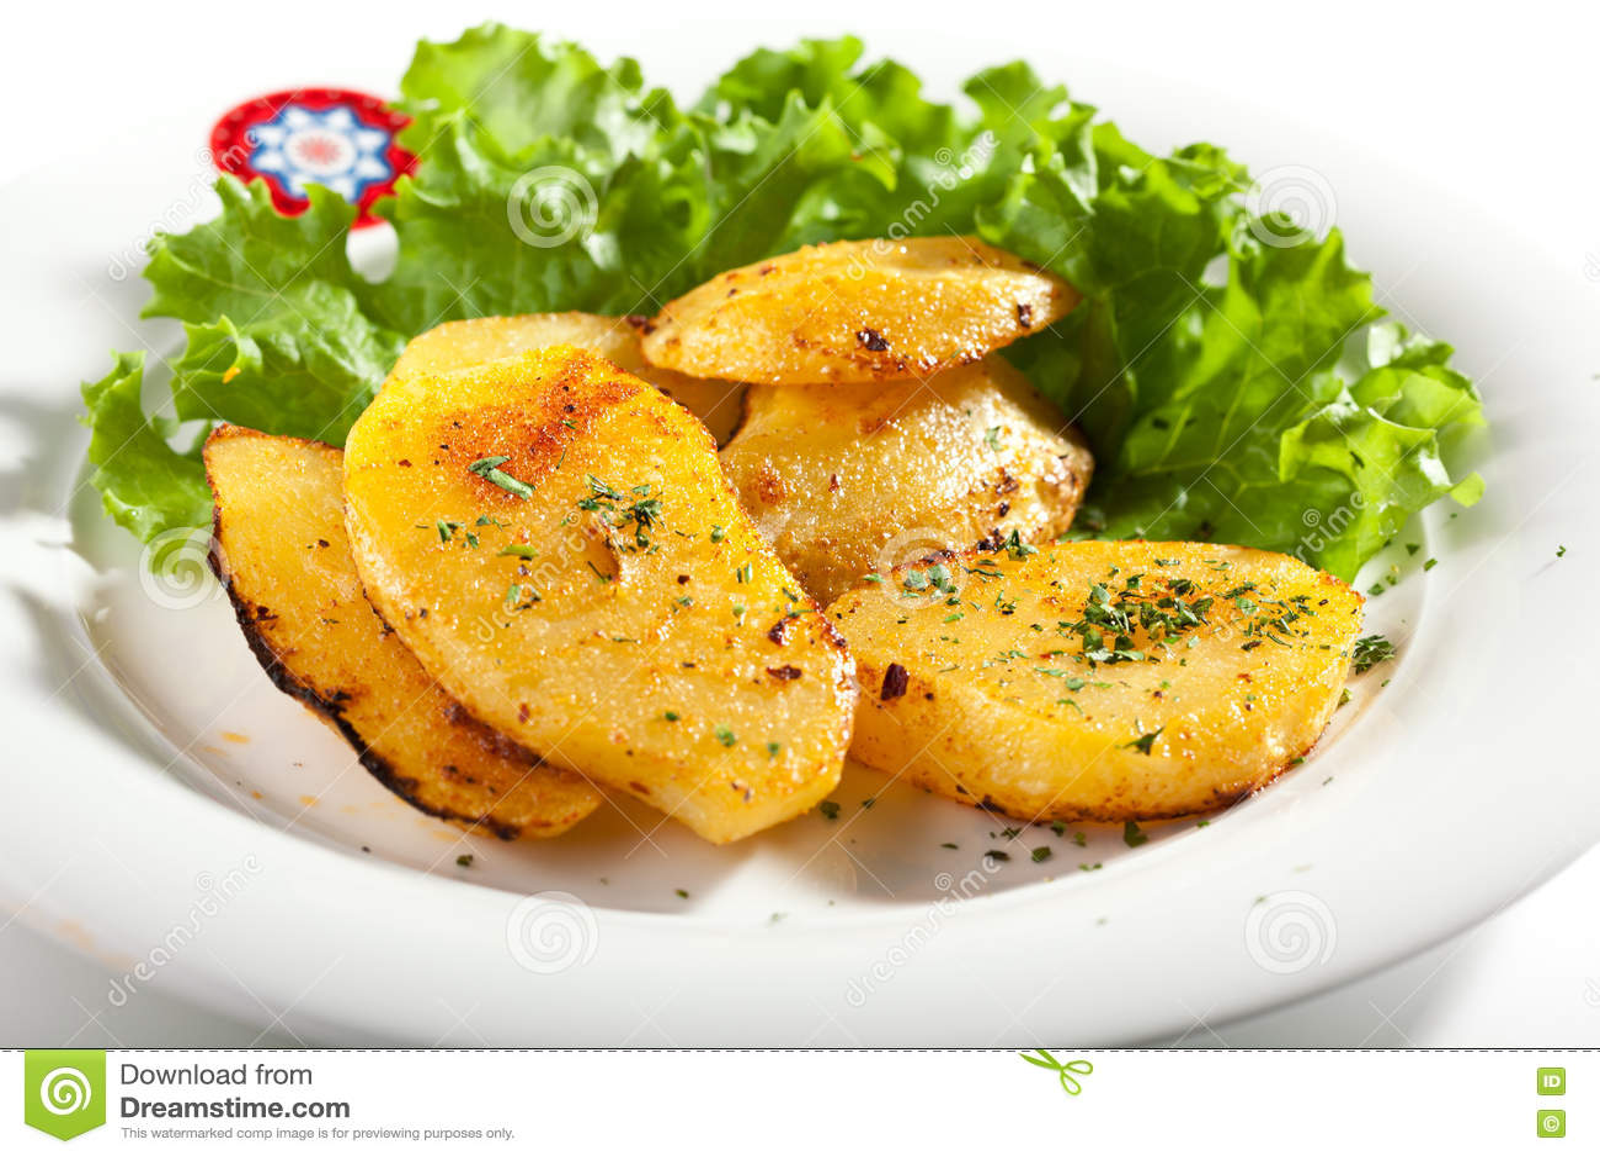 Fried Potato Slice